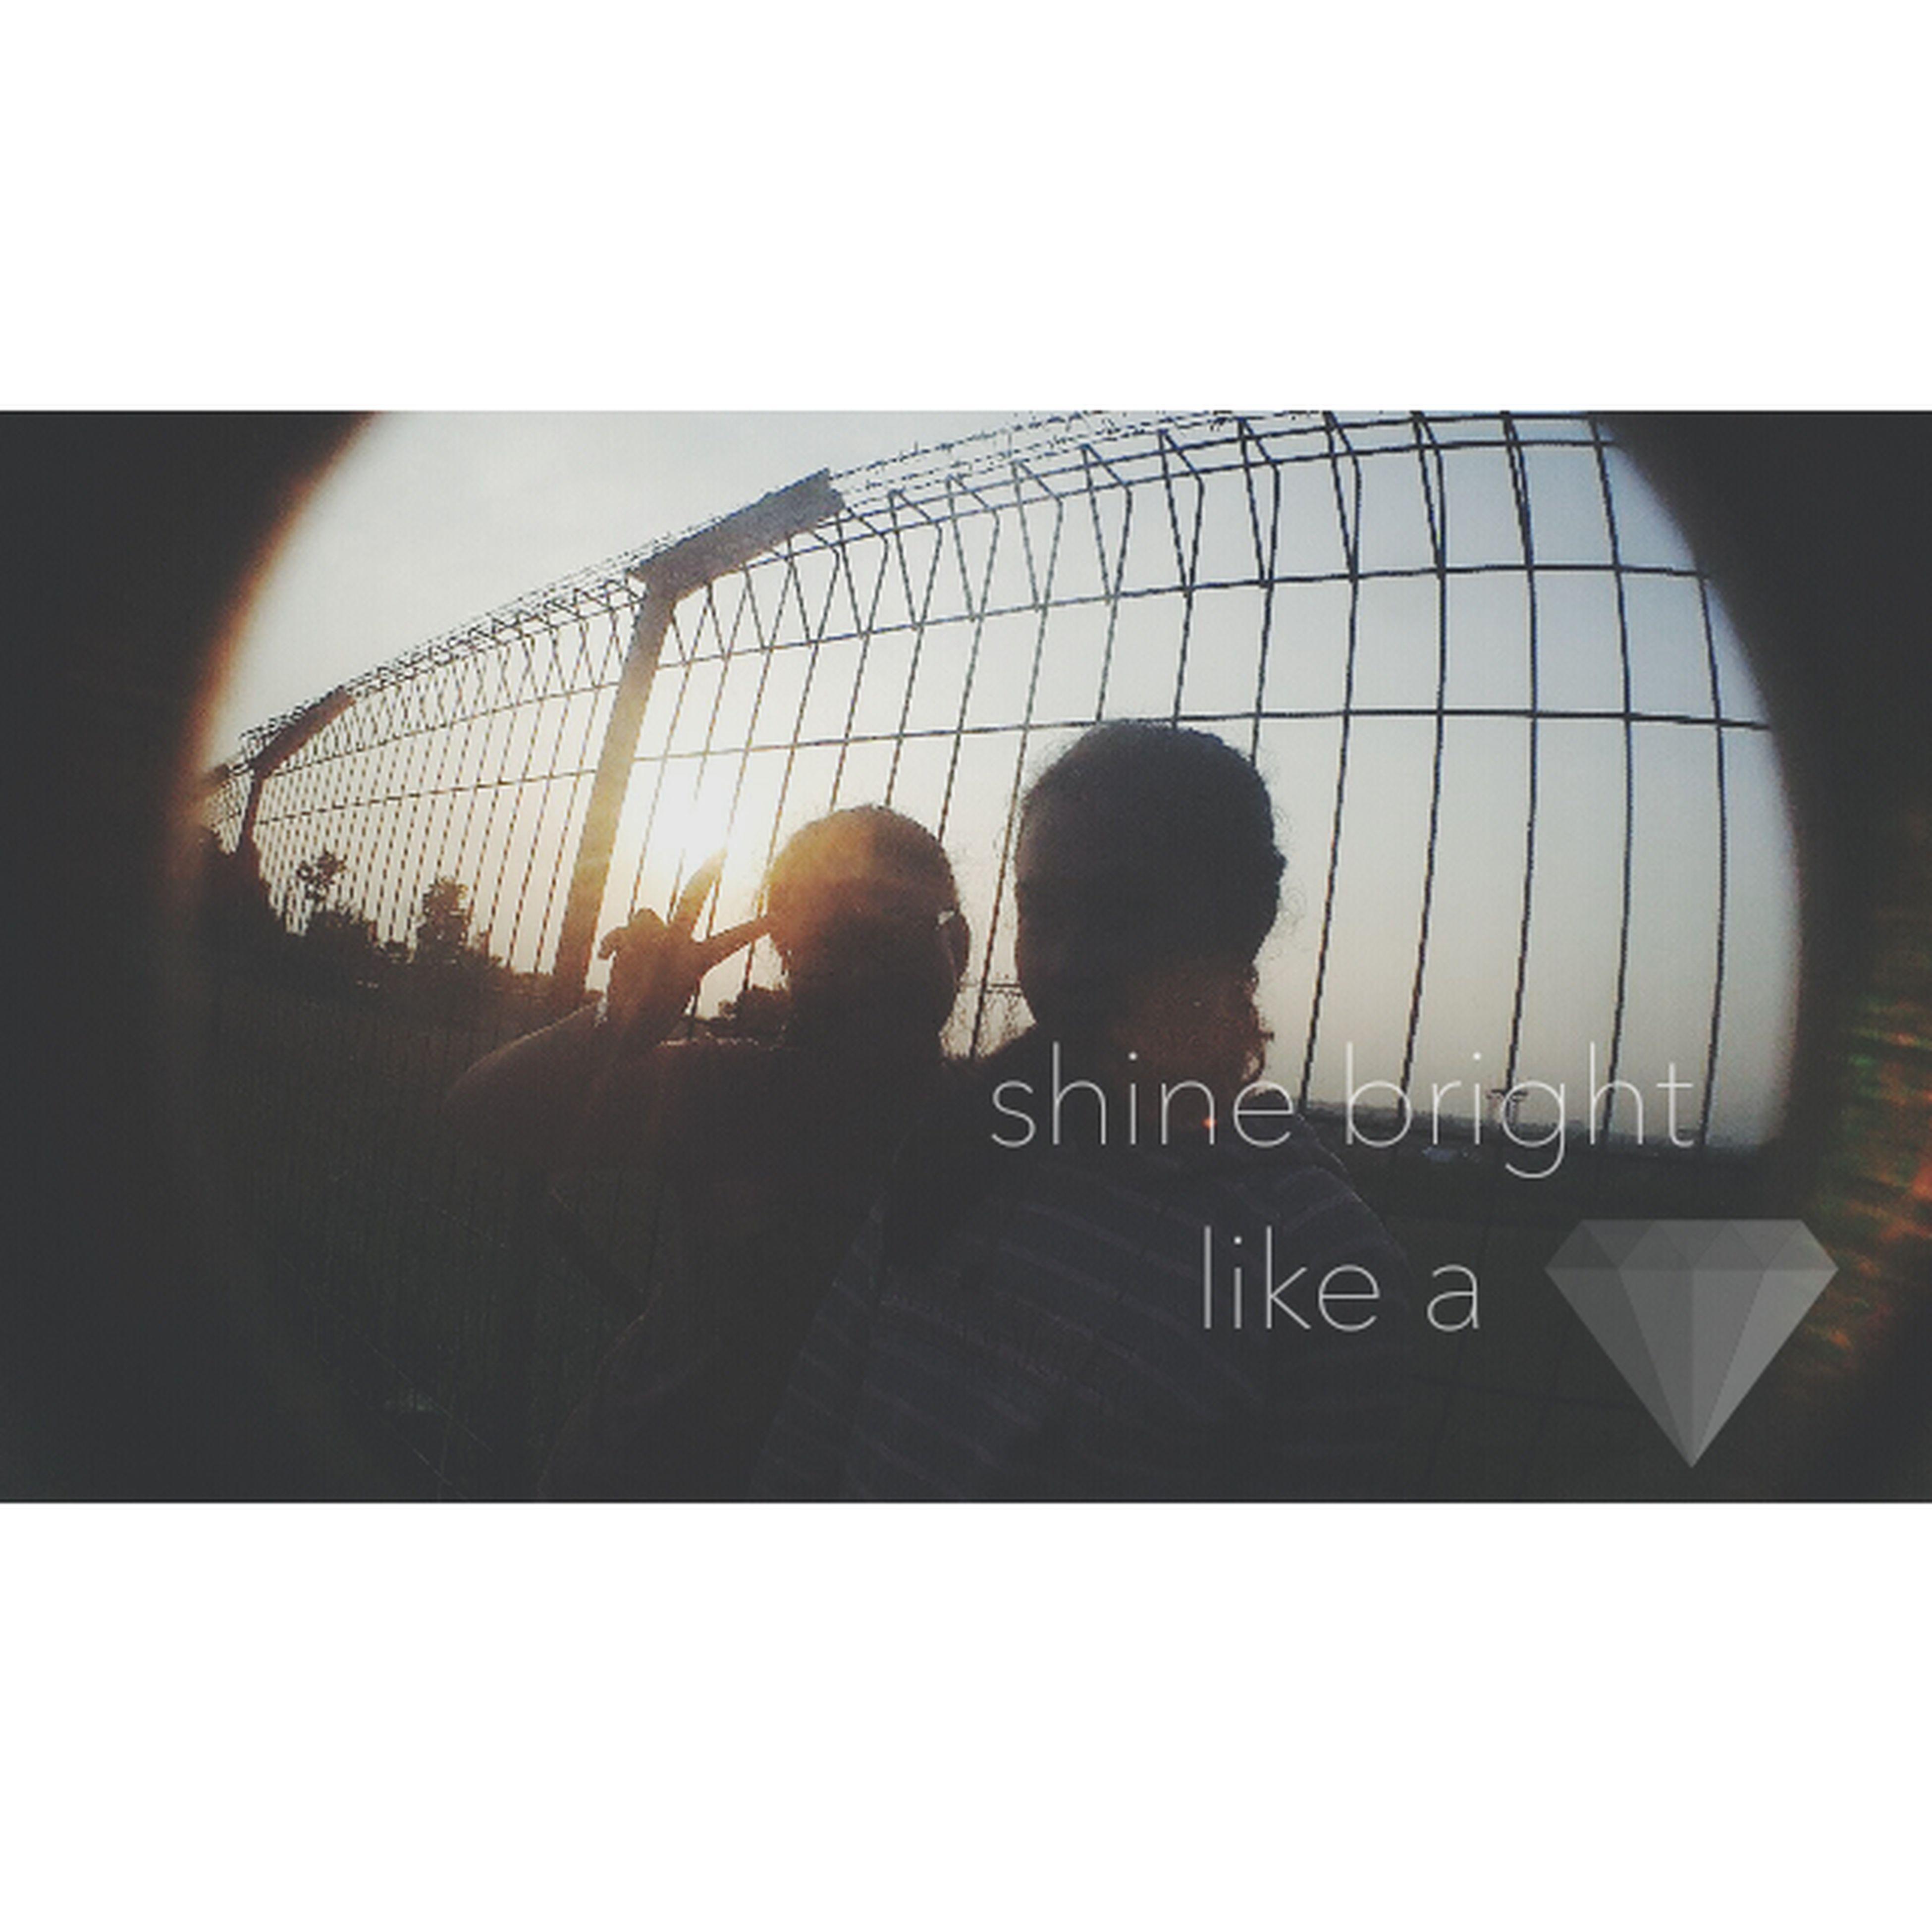 Shine bright like a? Gowes Sunrise 17AUgust14 Friend